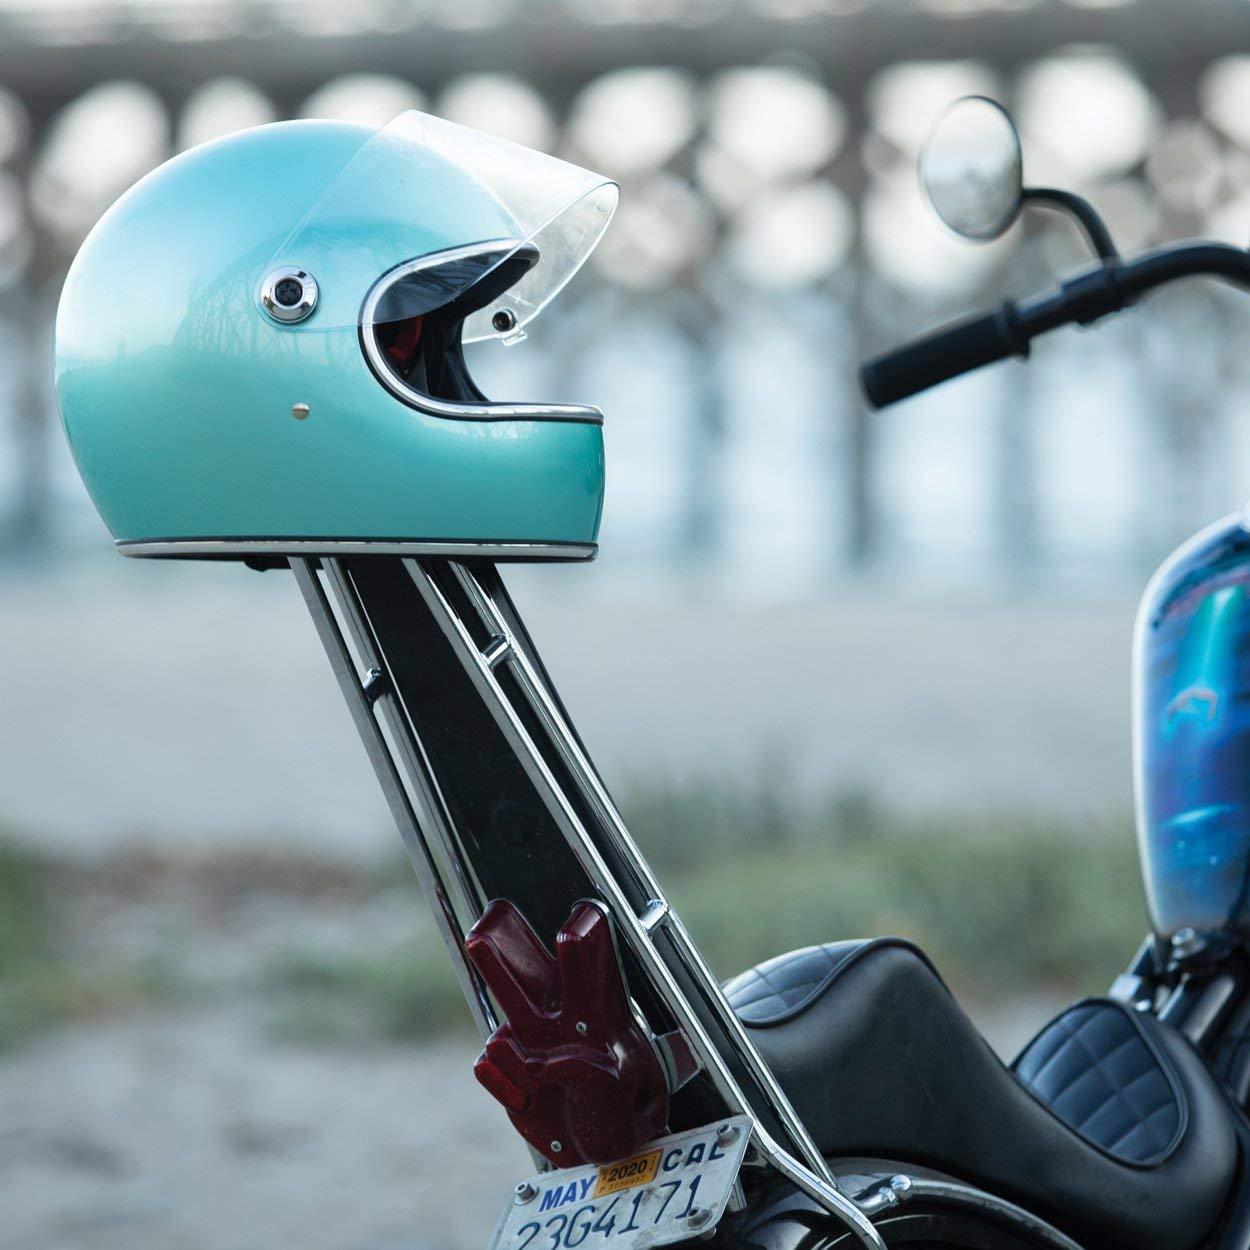 America Europa Helmet Biker Custom Vintage Retro A/ño 70 Talla XS /& Dot Casco Integral Biltwell Gringo S Metallic Sea Foam homologado Doble homologaci/ón ECE